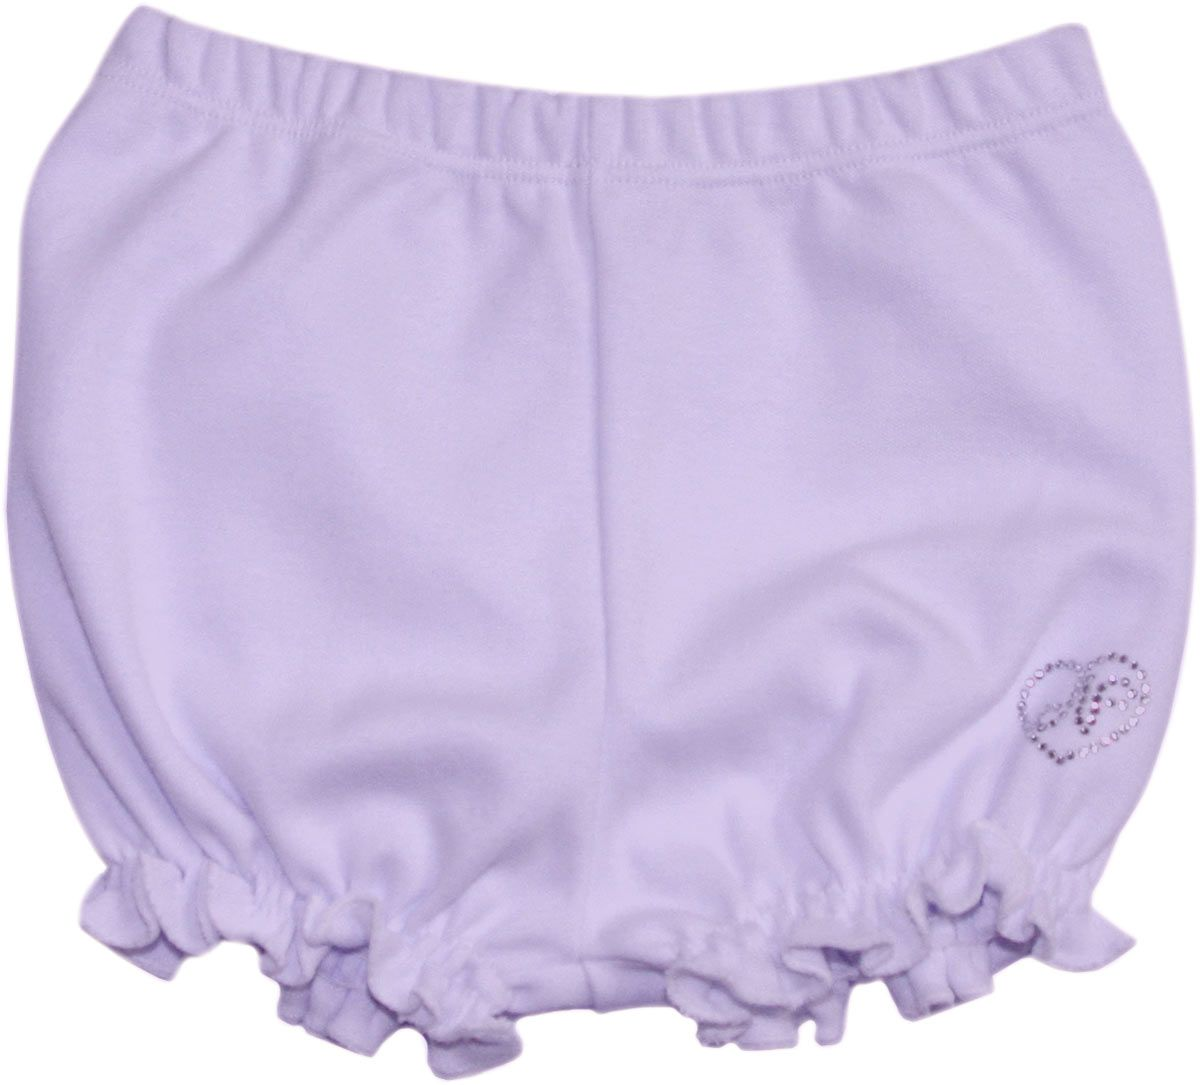 70.079 - Shorts